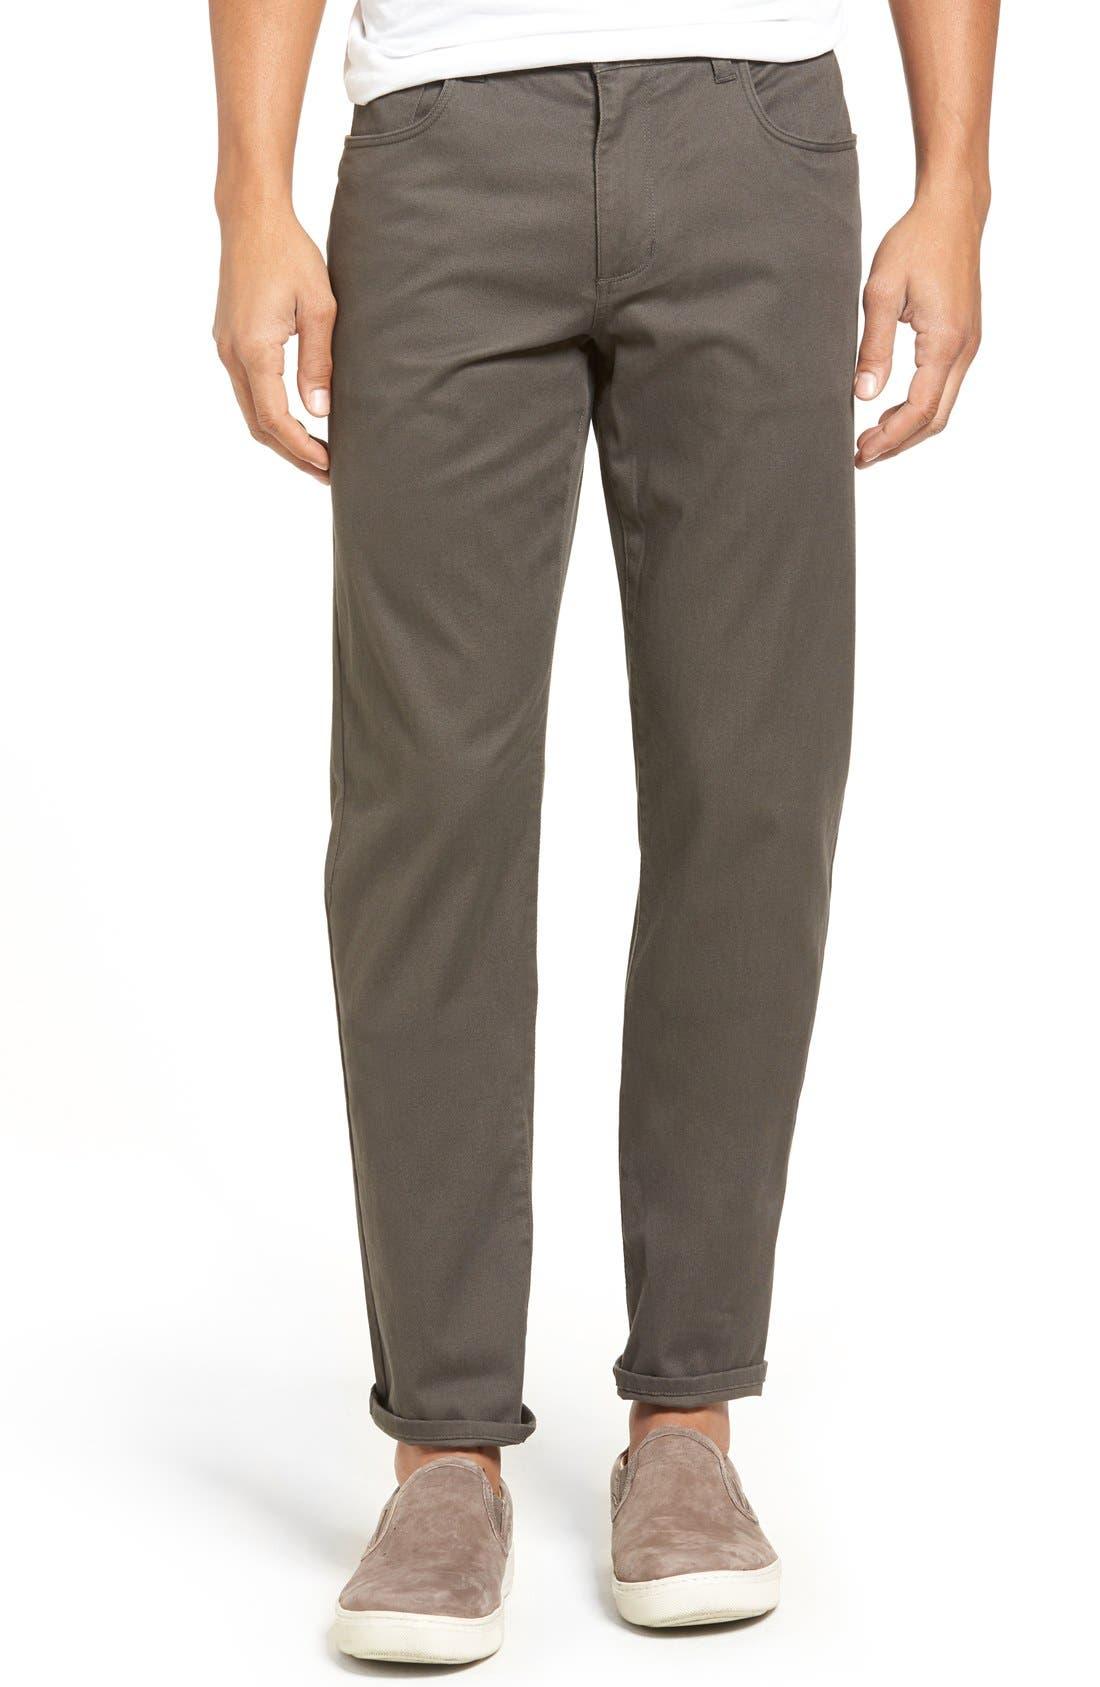 Soho Slim Fit Five-Pocket Pants,                             Main thumbnail 1, color,                             GREY